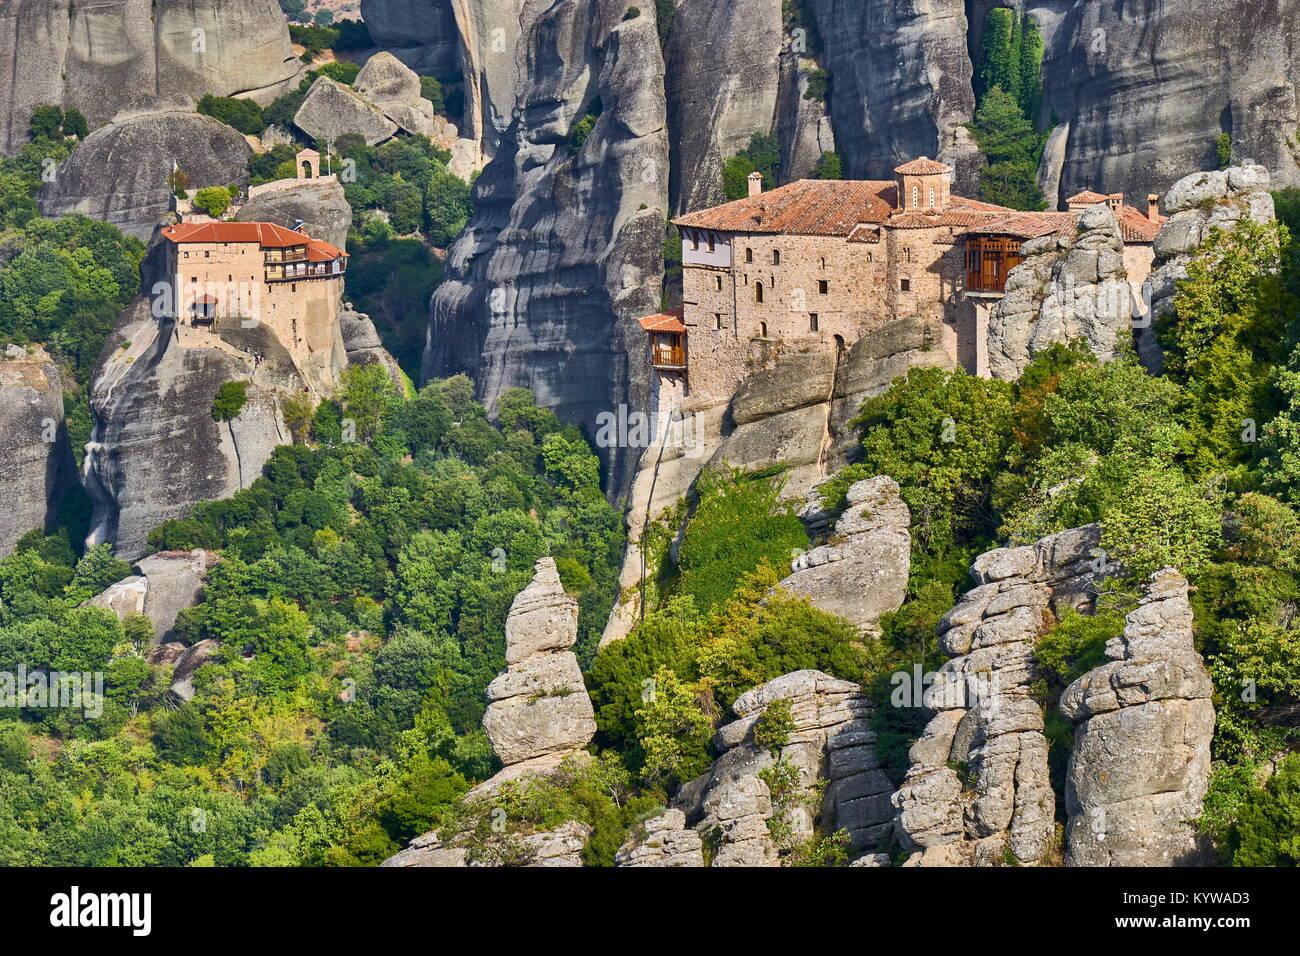 Grecia - Monastero Roussanou, Meteora Immagini Stock